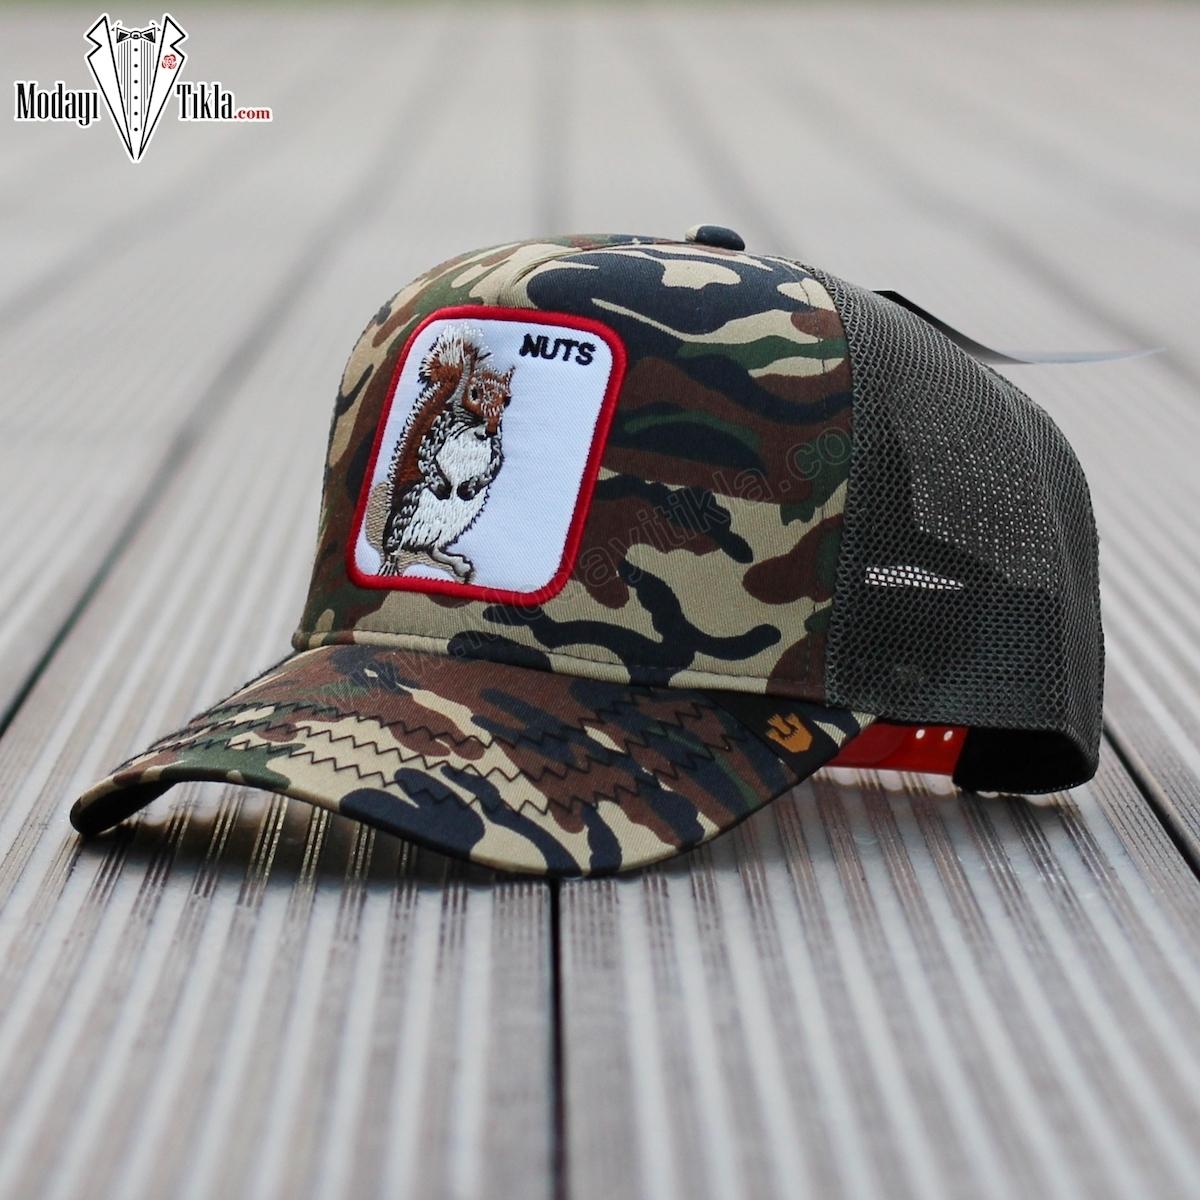 İthal Goorin Bros Nuts Kamuflajlı Şapka